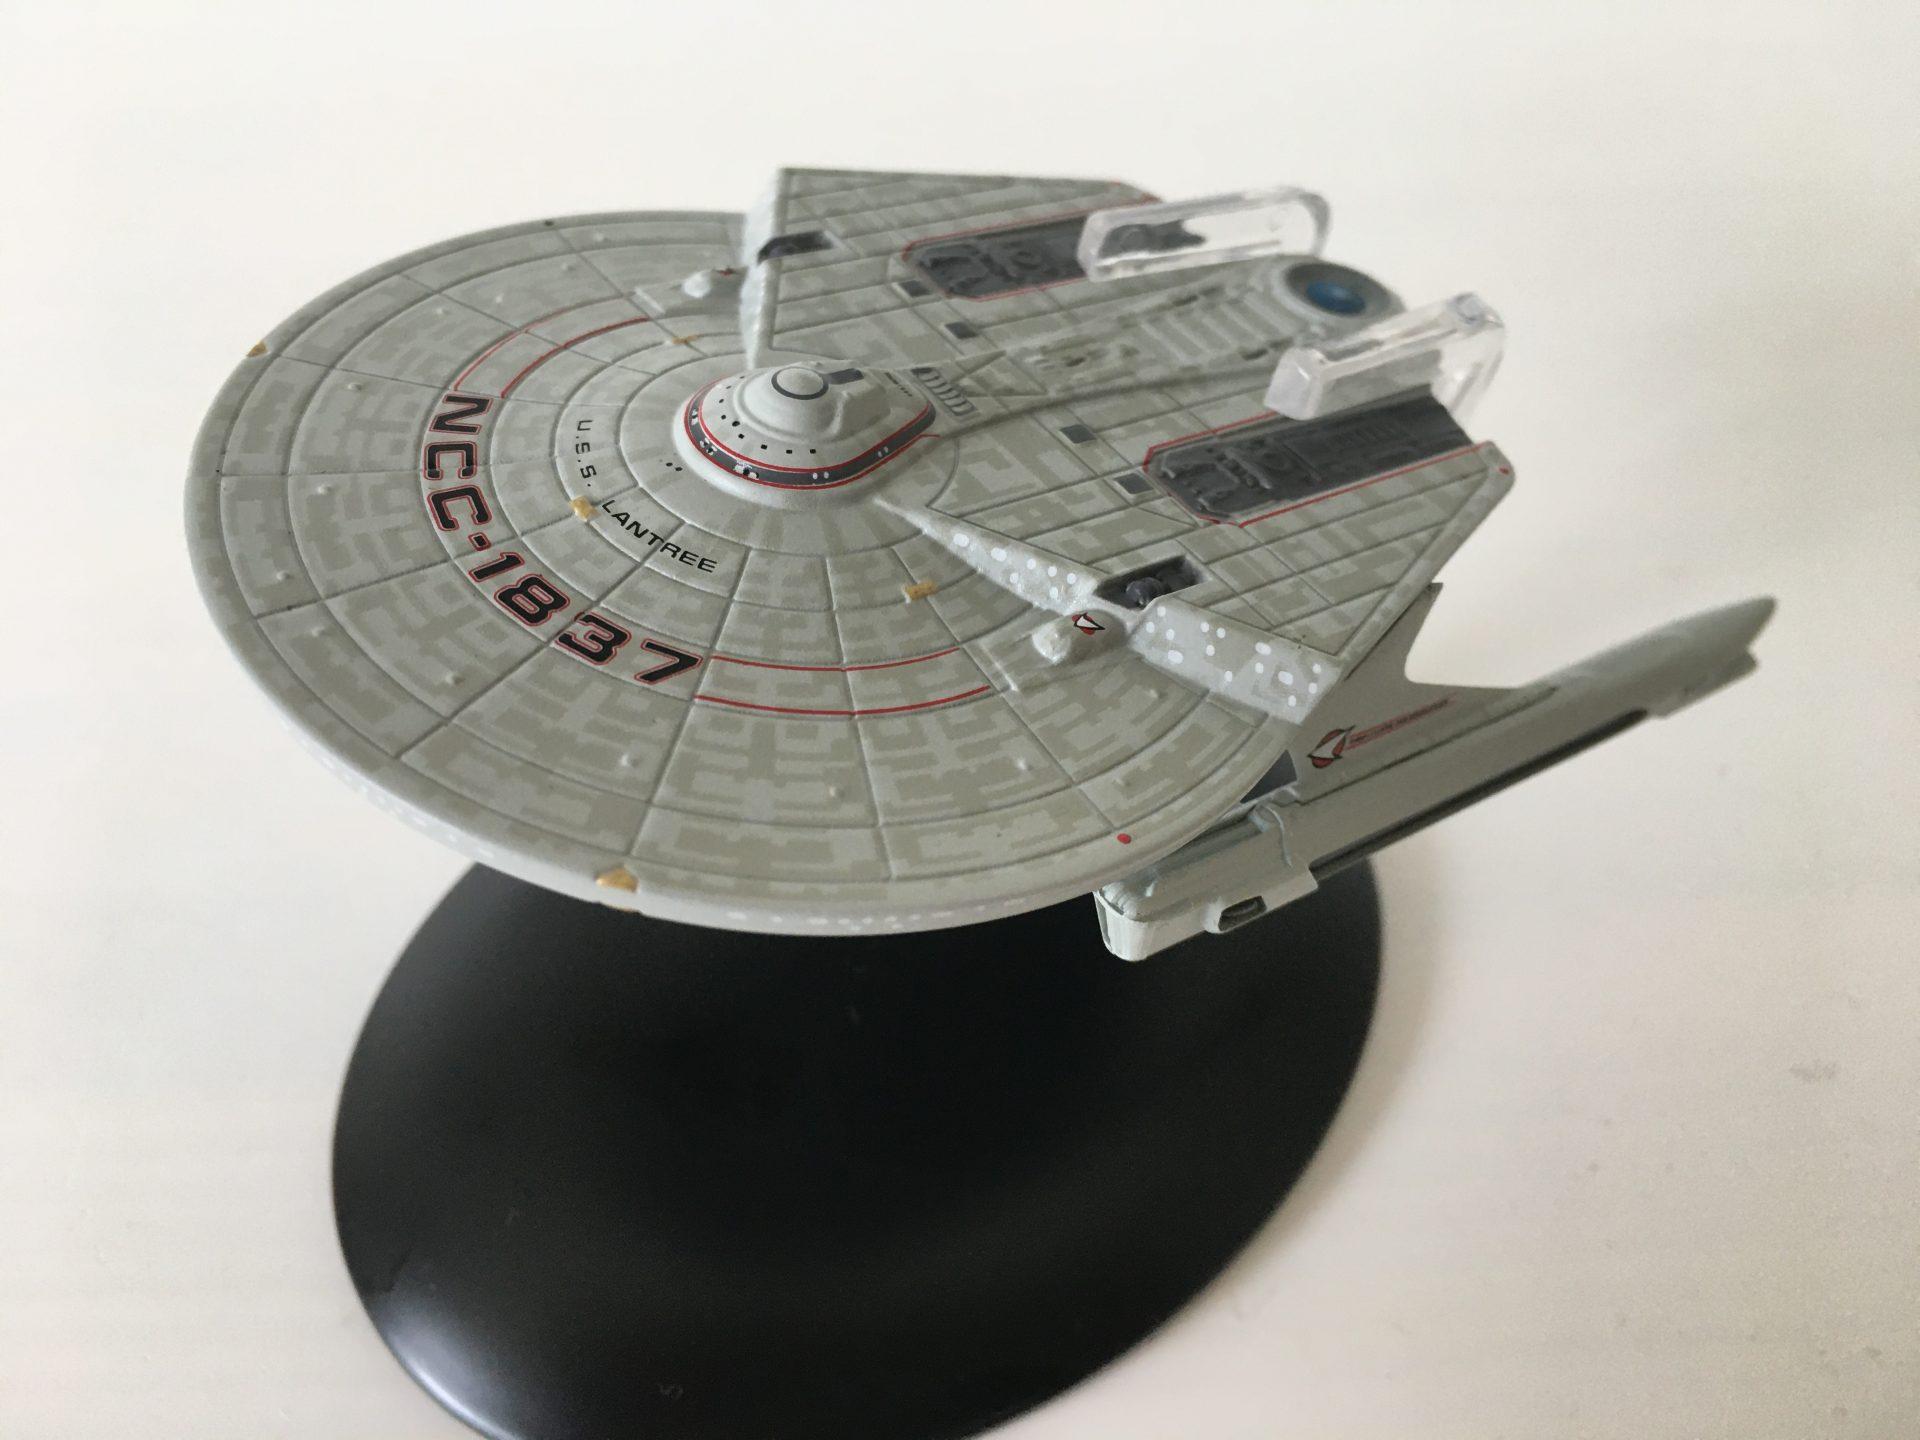 Die USS Lantree aus Star Trek: The Next Generation (Foto: Star Trek HD)